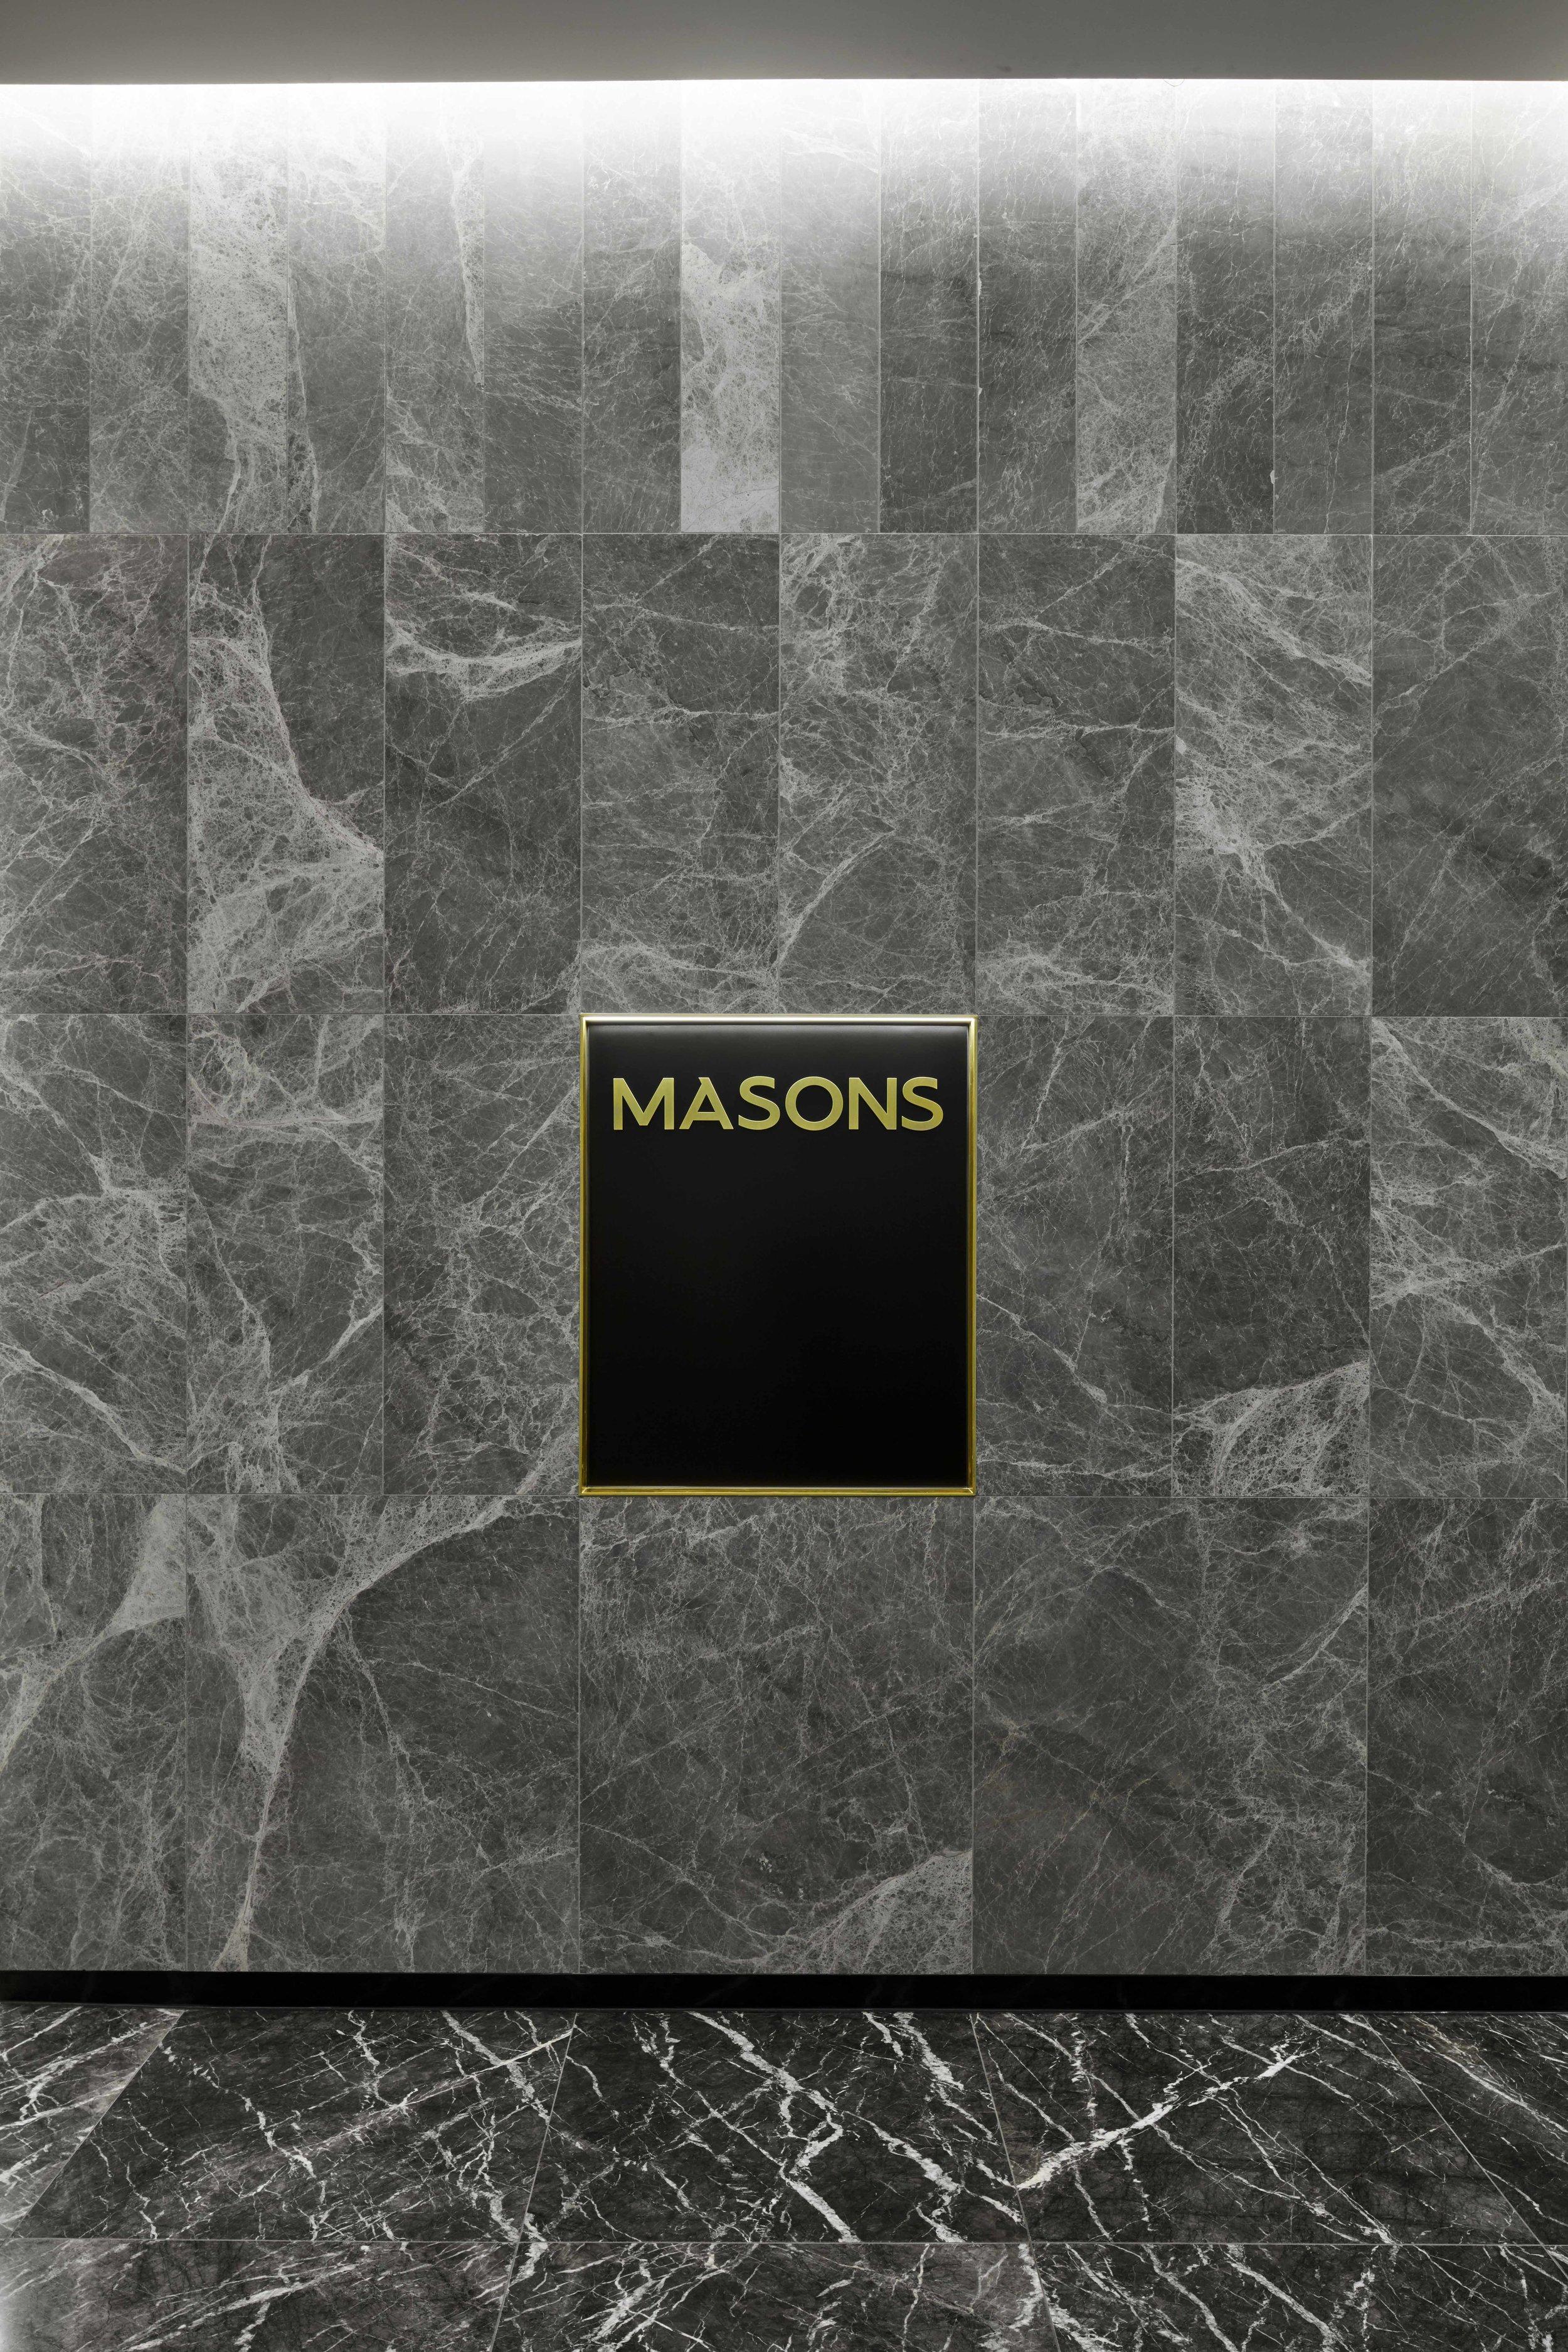 Masons_0189_sml.jpg